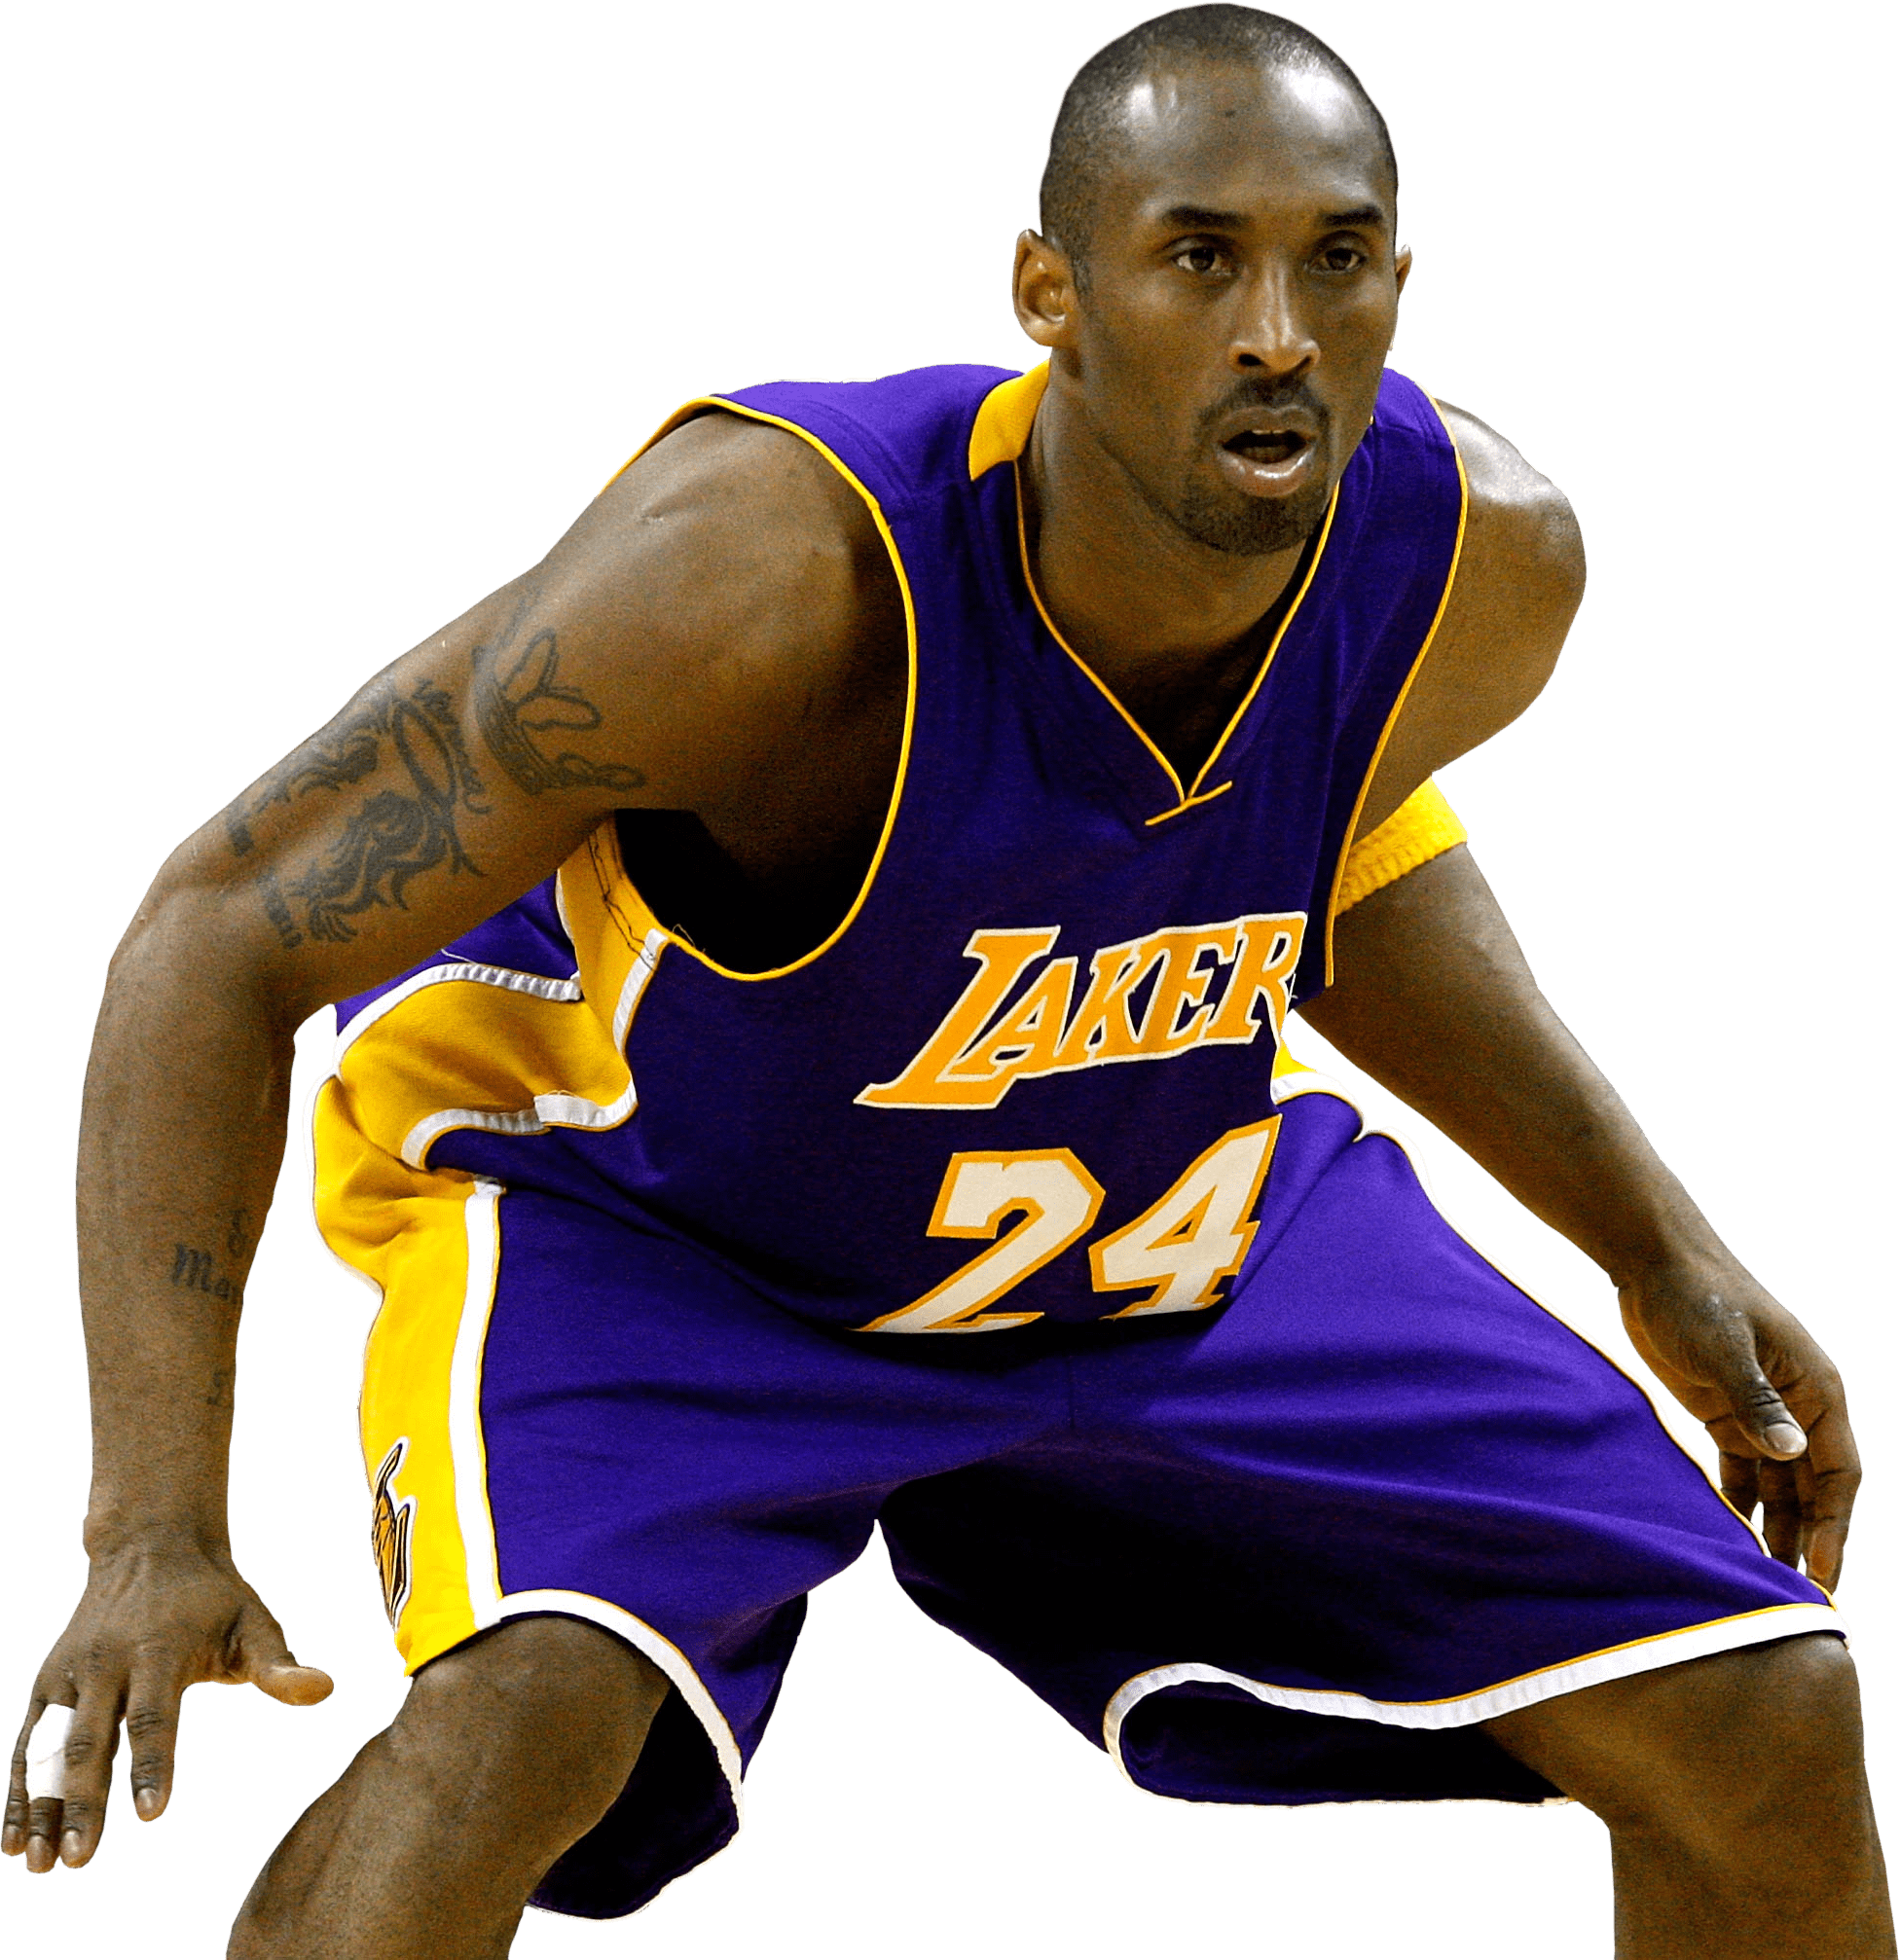 Kobe Bryant Defense - Basketball Players PNG HD